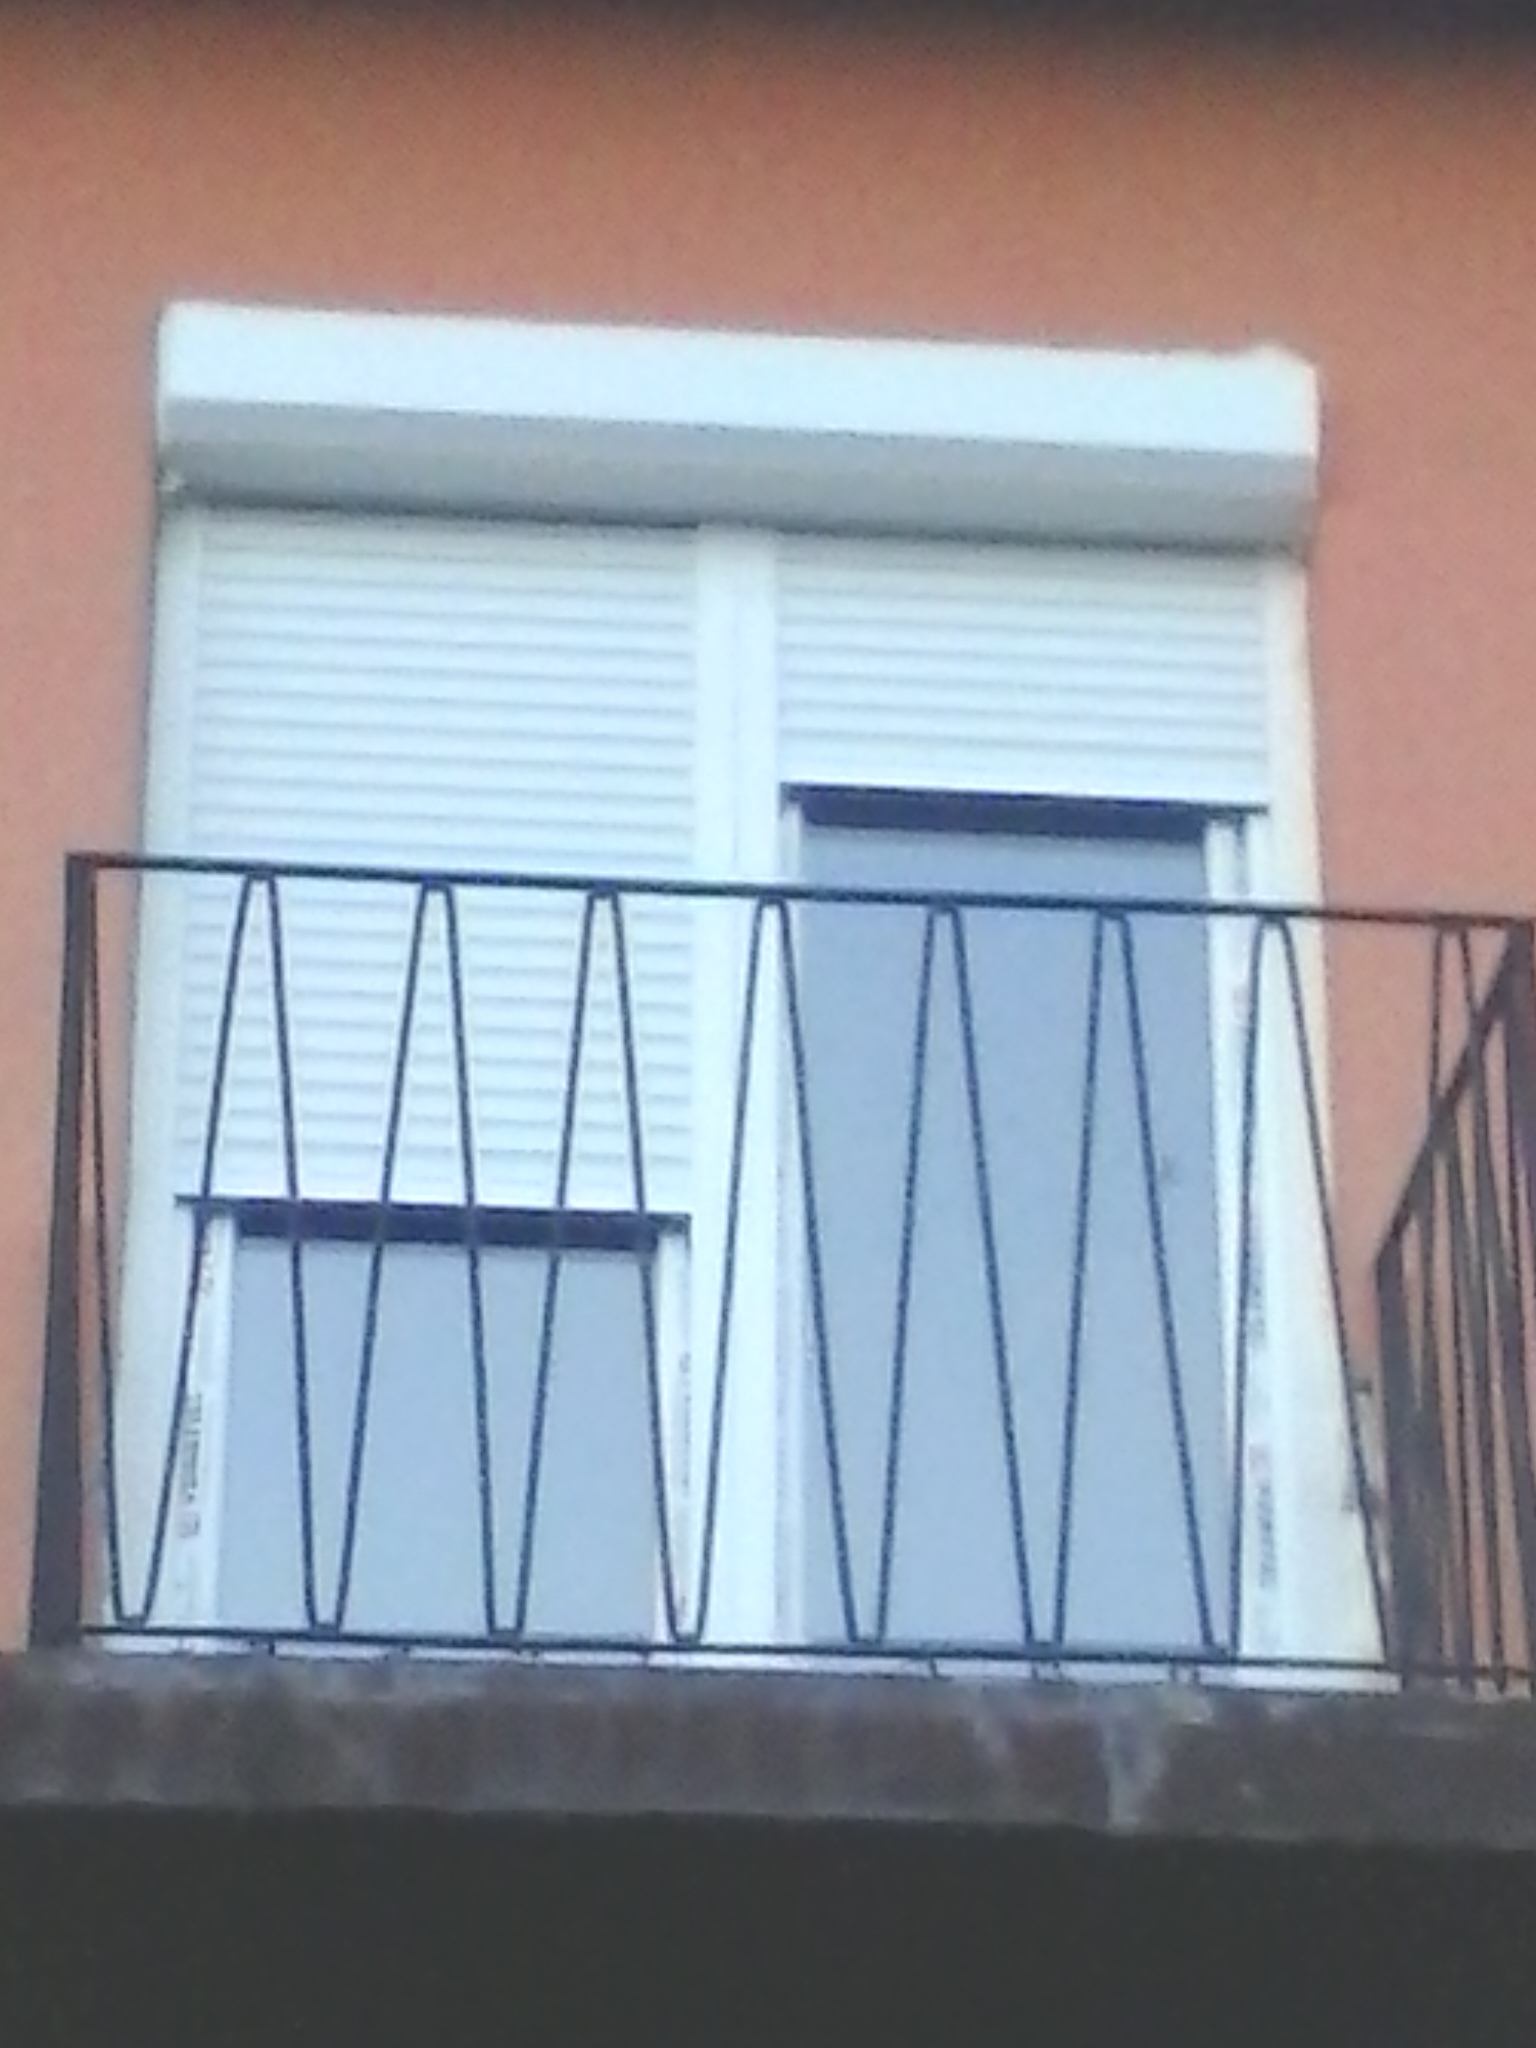 balkonac sa spoljnom roletnom